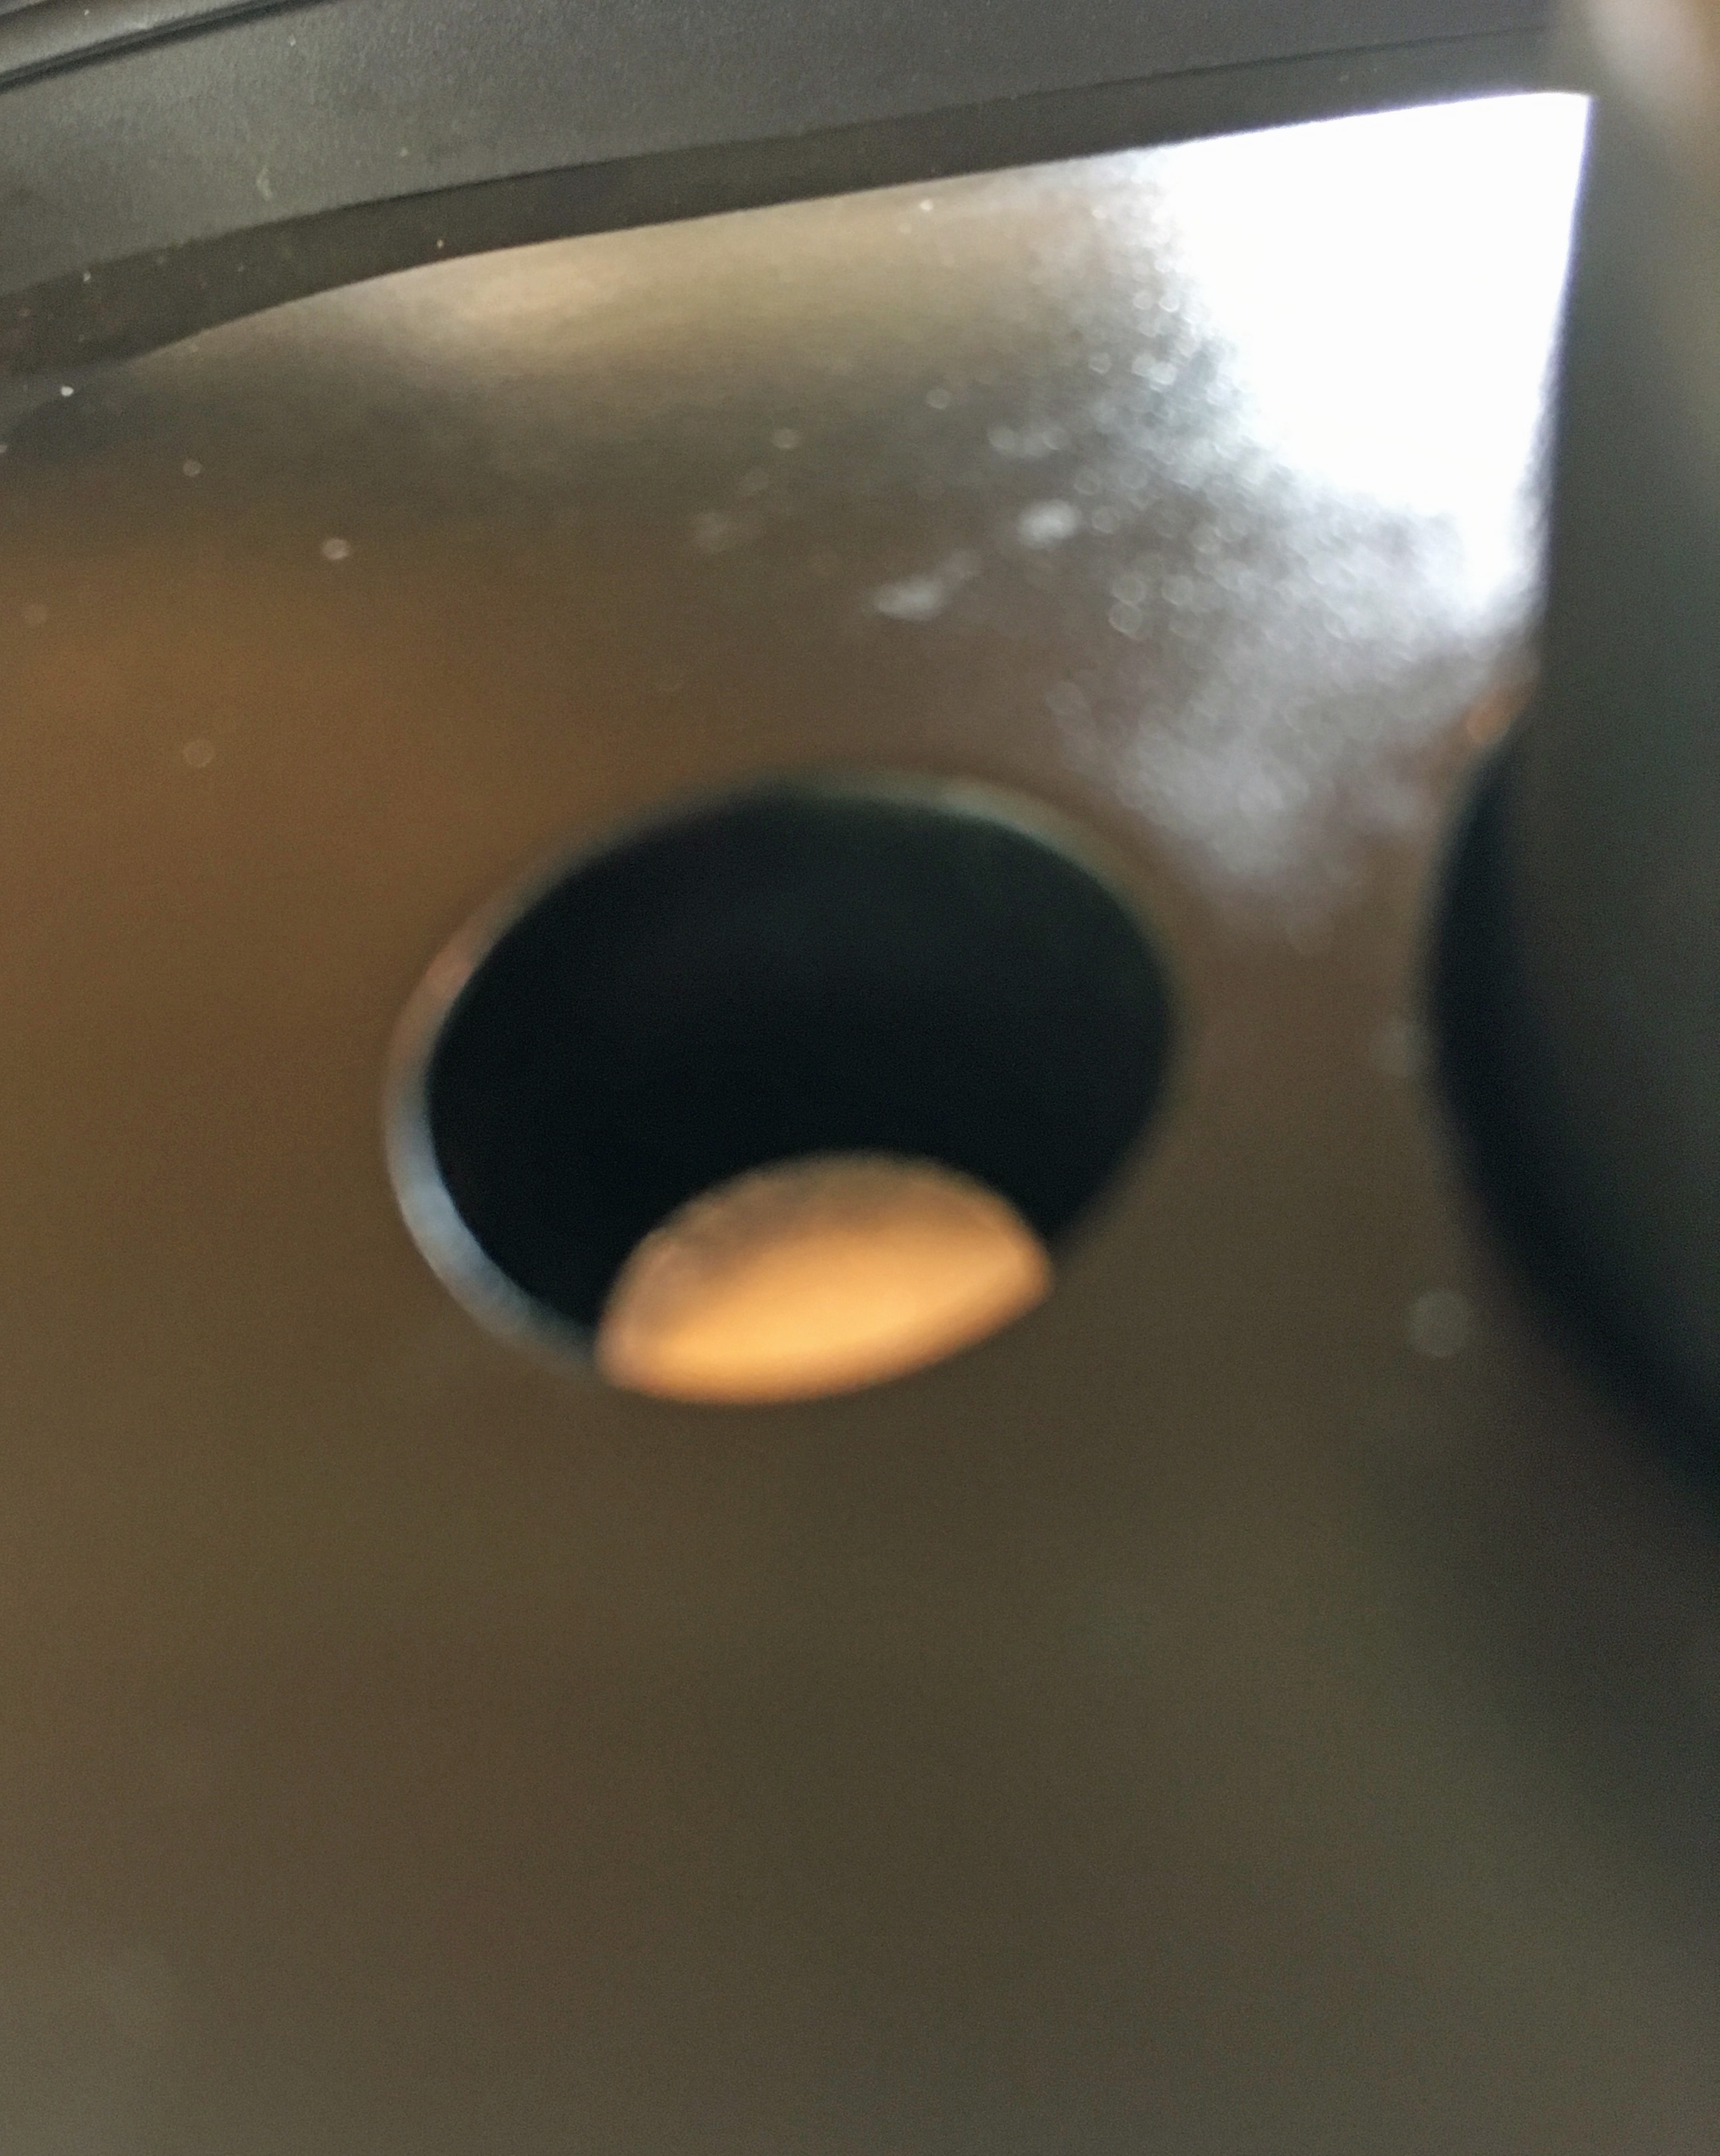 valve-down